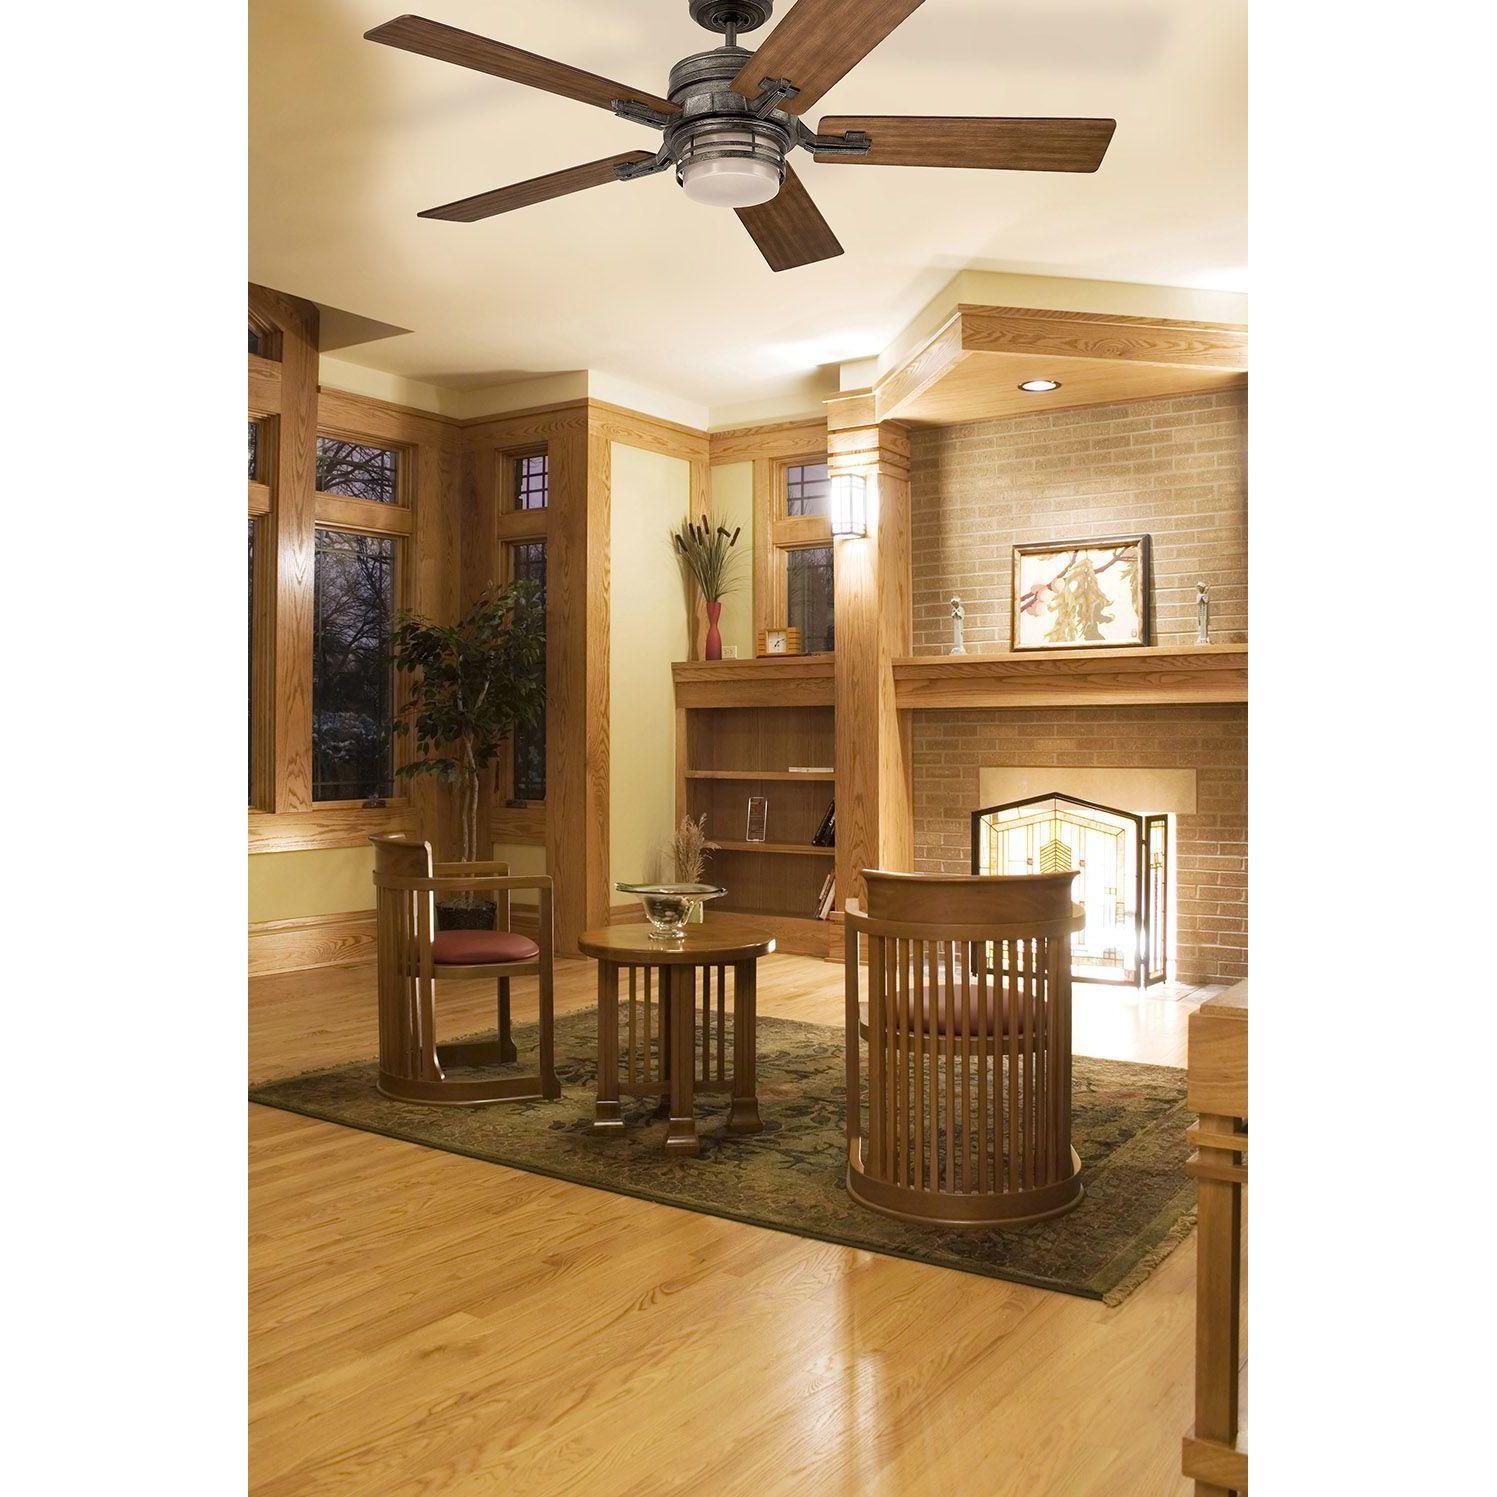 Emerson Amhurst 54 inch Vintage Steel Transitional Ceiling Fan